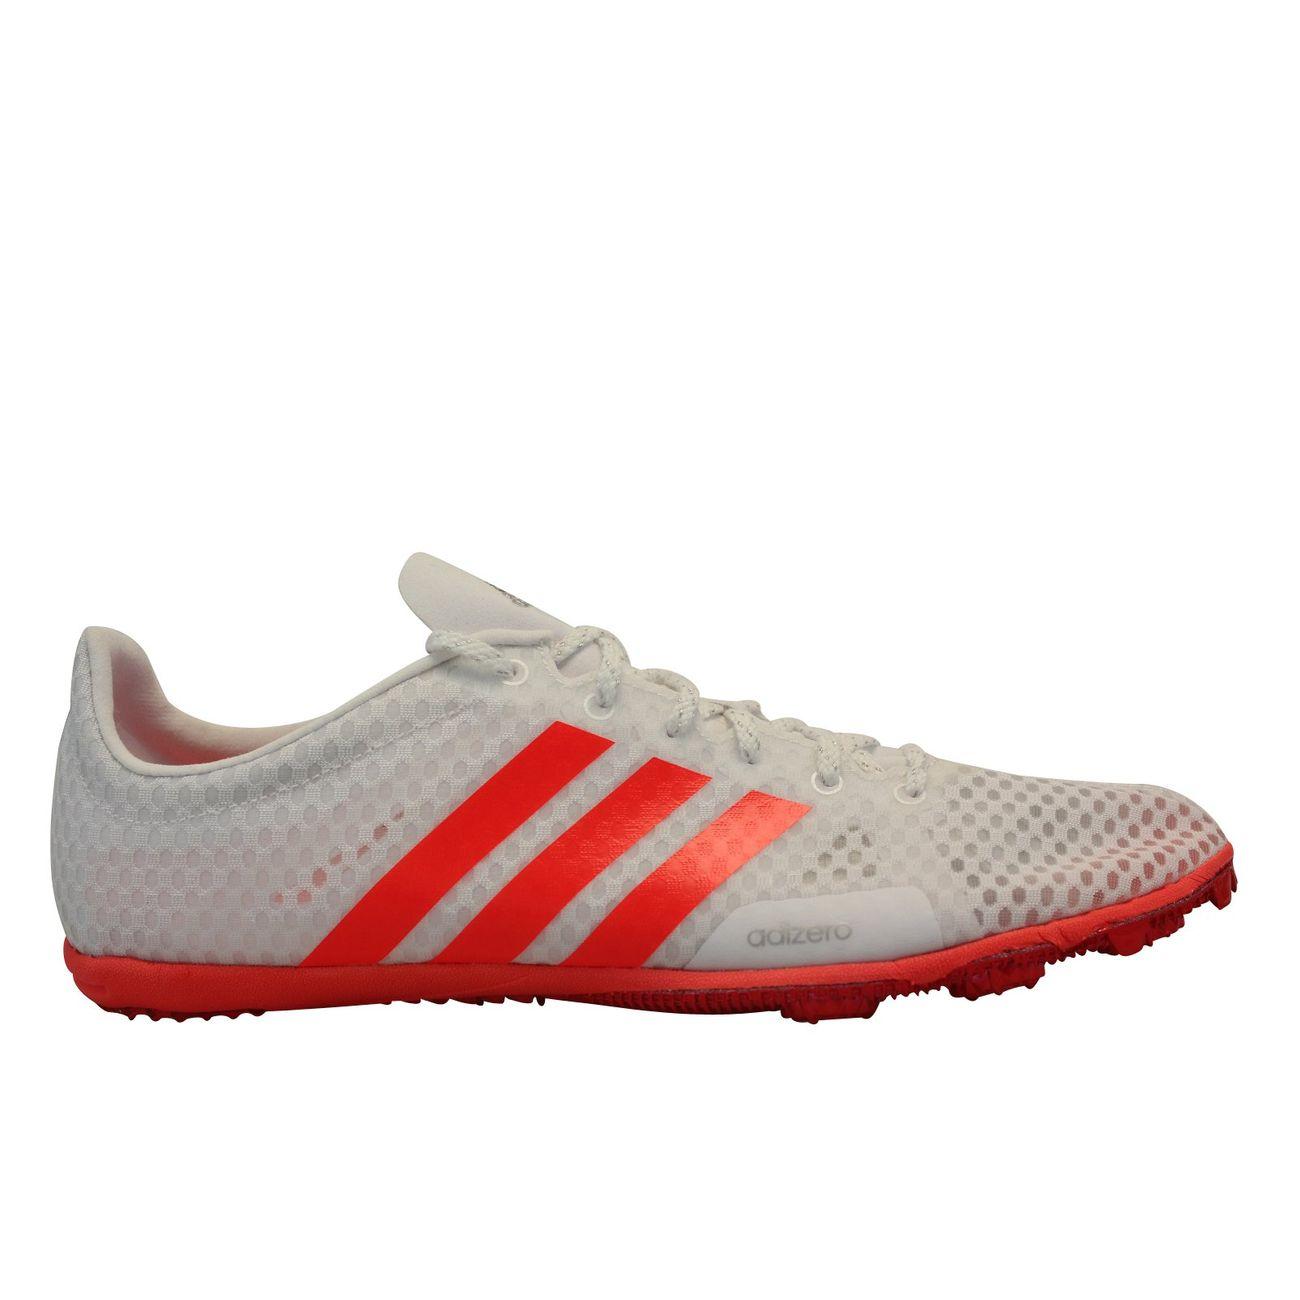 Mode Lifestyle homme ADIDAS Chaussures d'athlétisme Adidas Performance Adizero Ambition 4